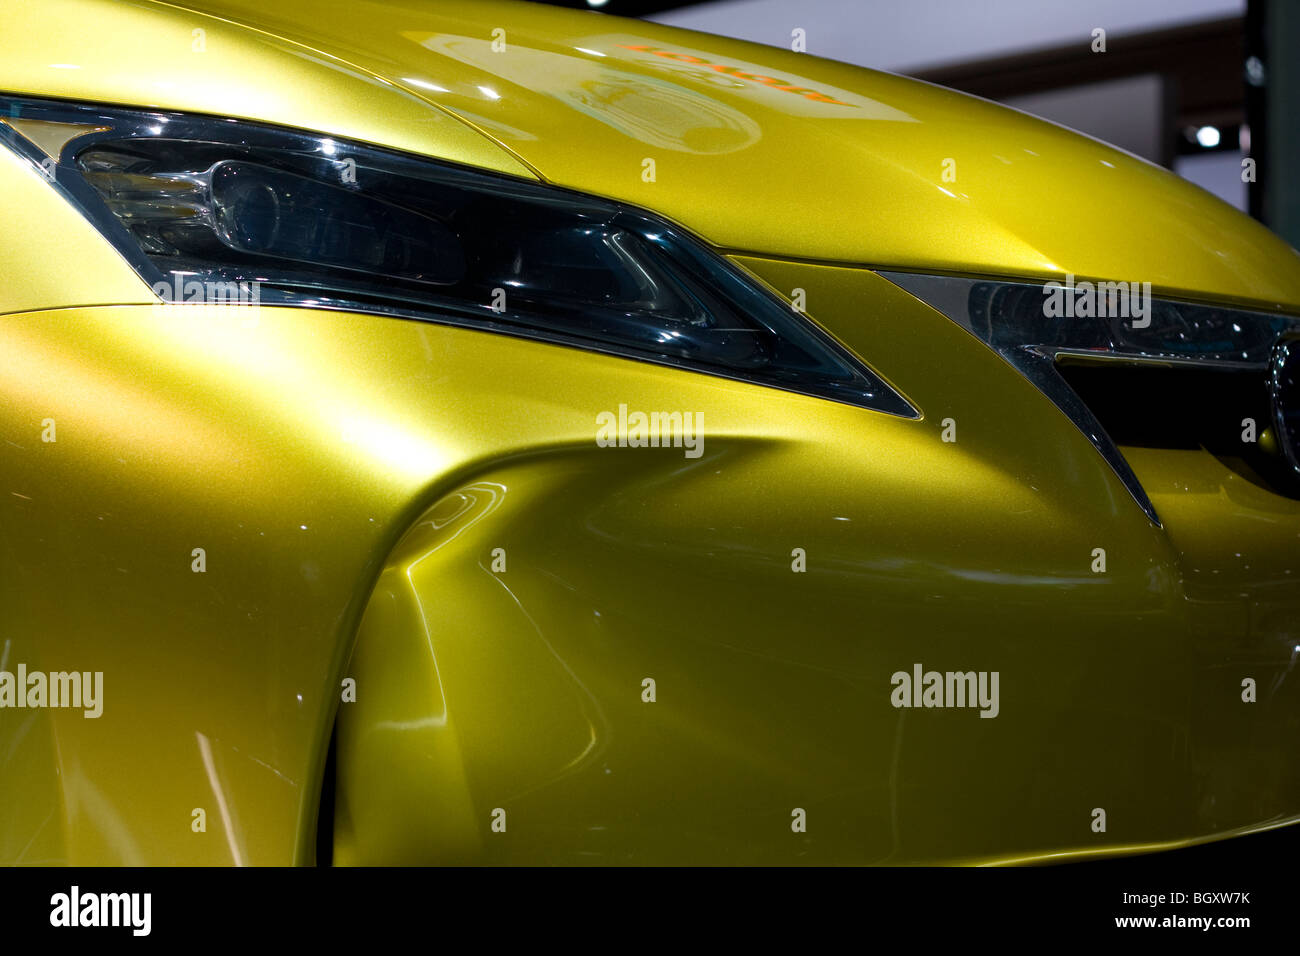 http://c8.alamy.com/comp/BGXW7K/2009-2010-lexus-lf-ch-concept-at-2010-north-american-international-BGXW7K.jpg